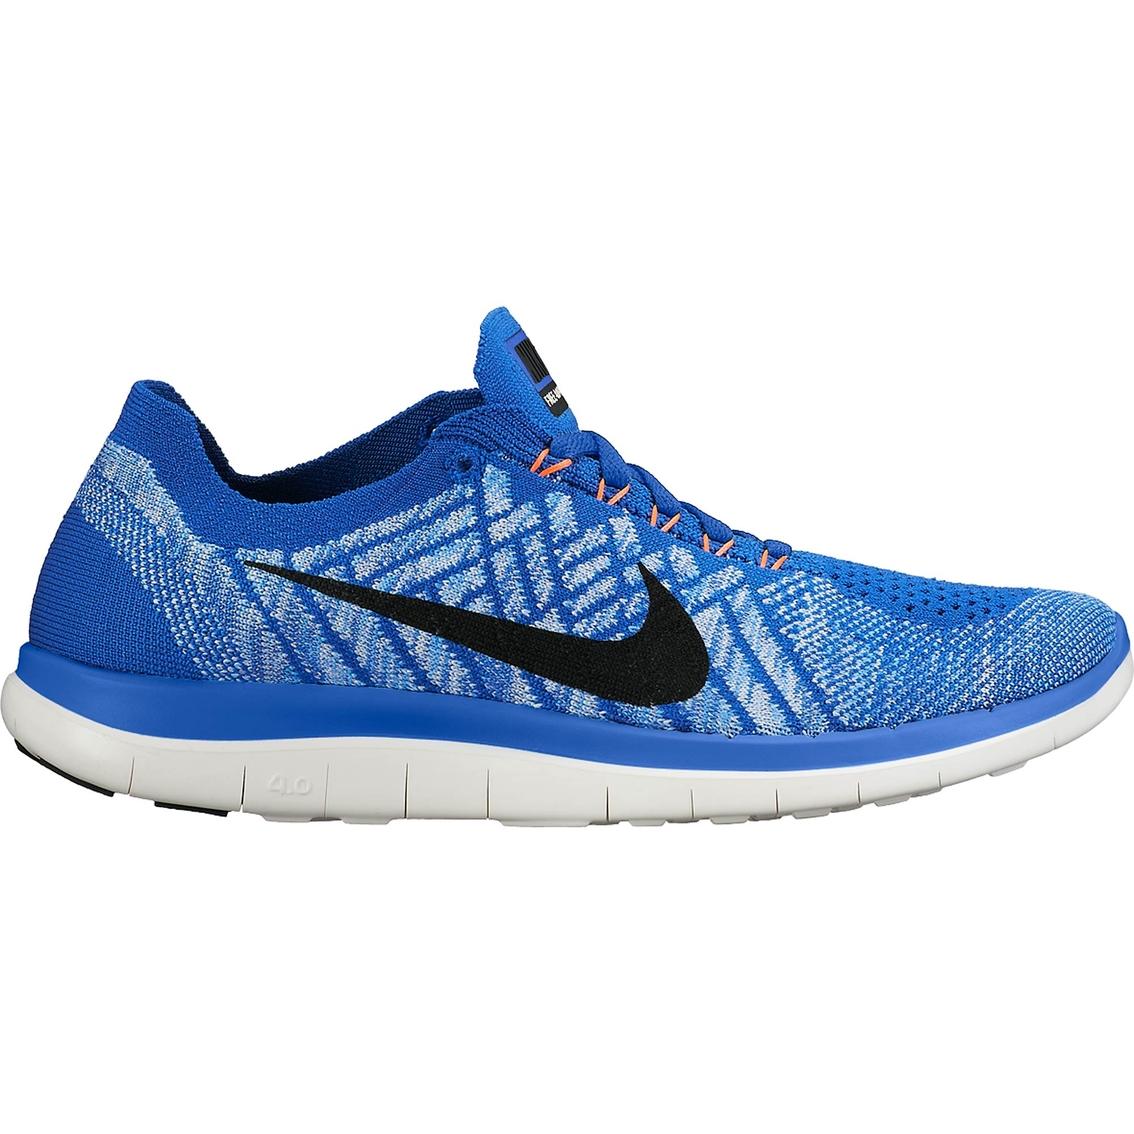 Nike Women's Nike 'Free 4.0 Flyknit' Running Shoes from Walmart | Shop